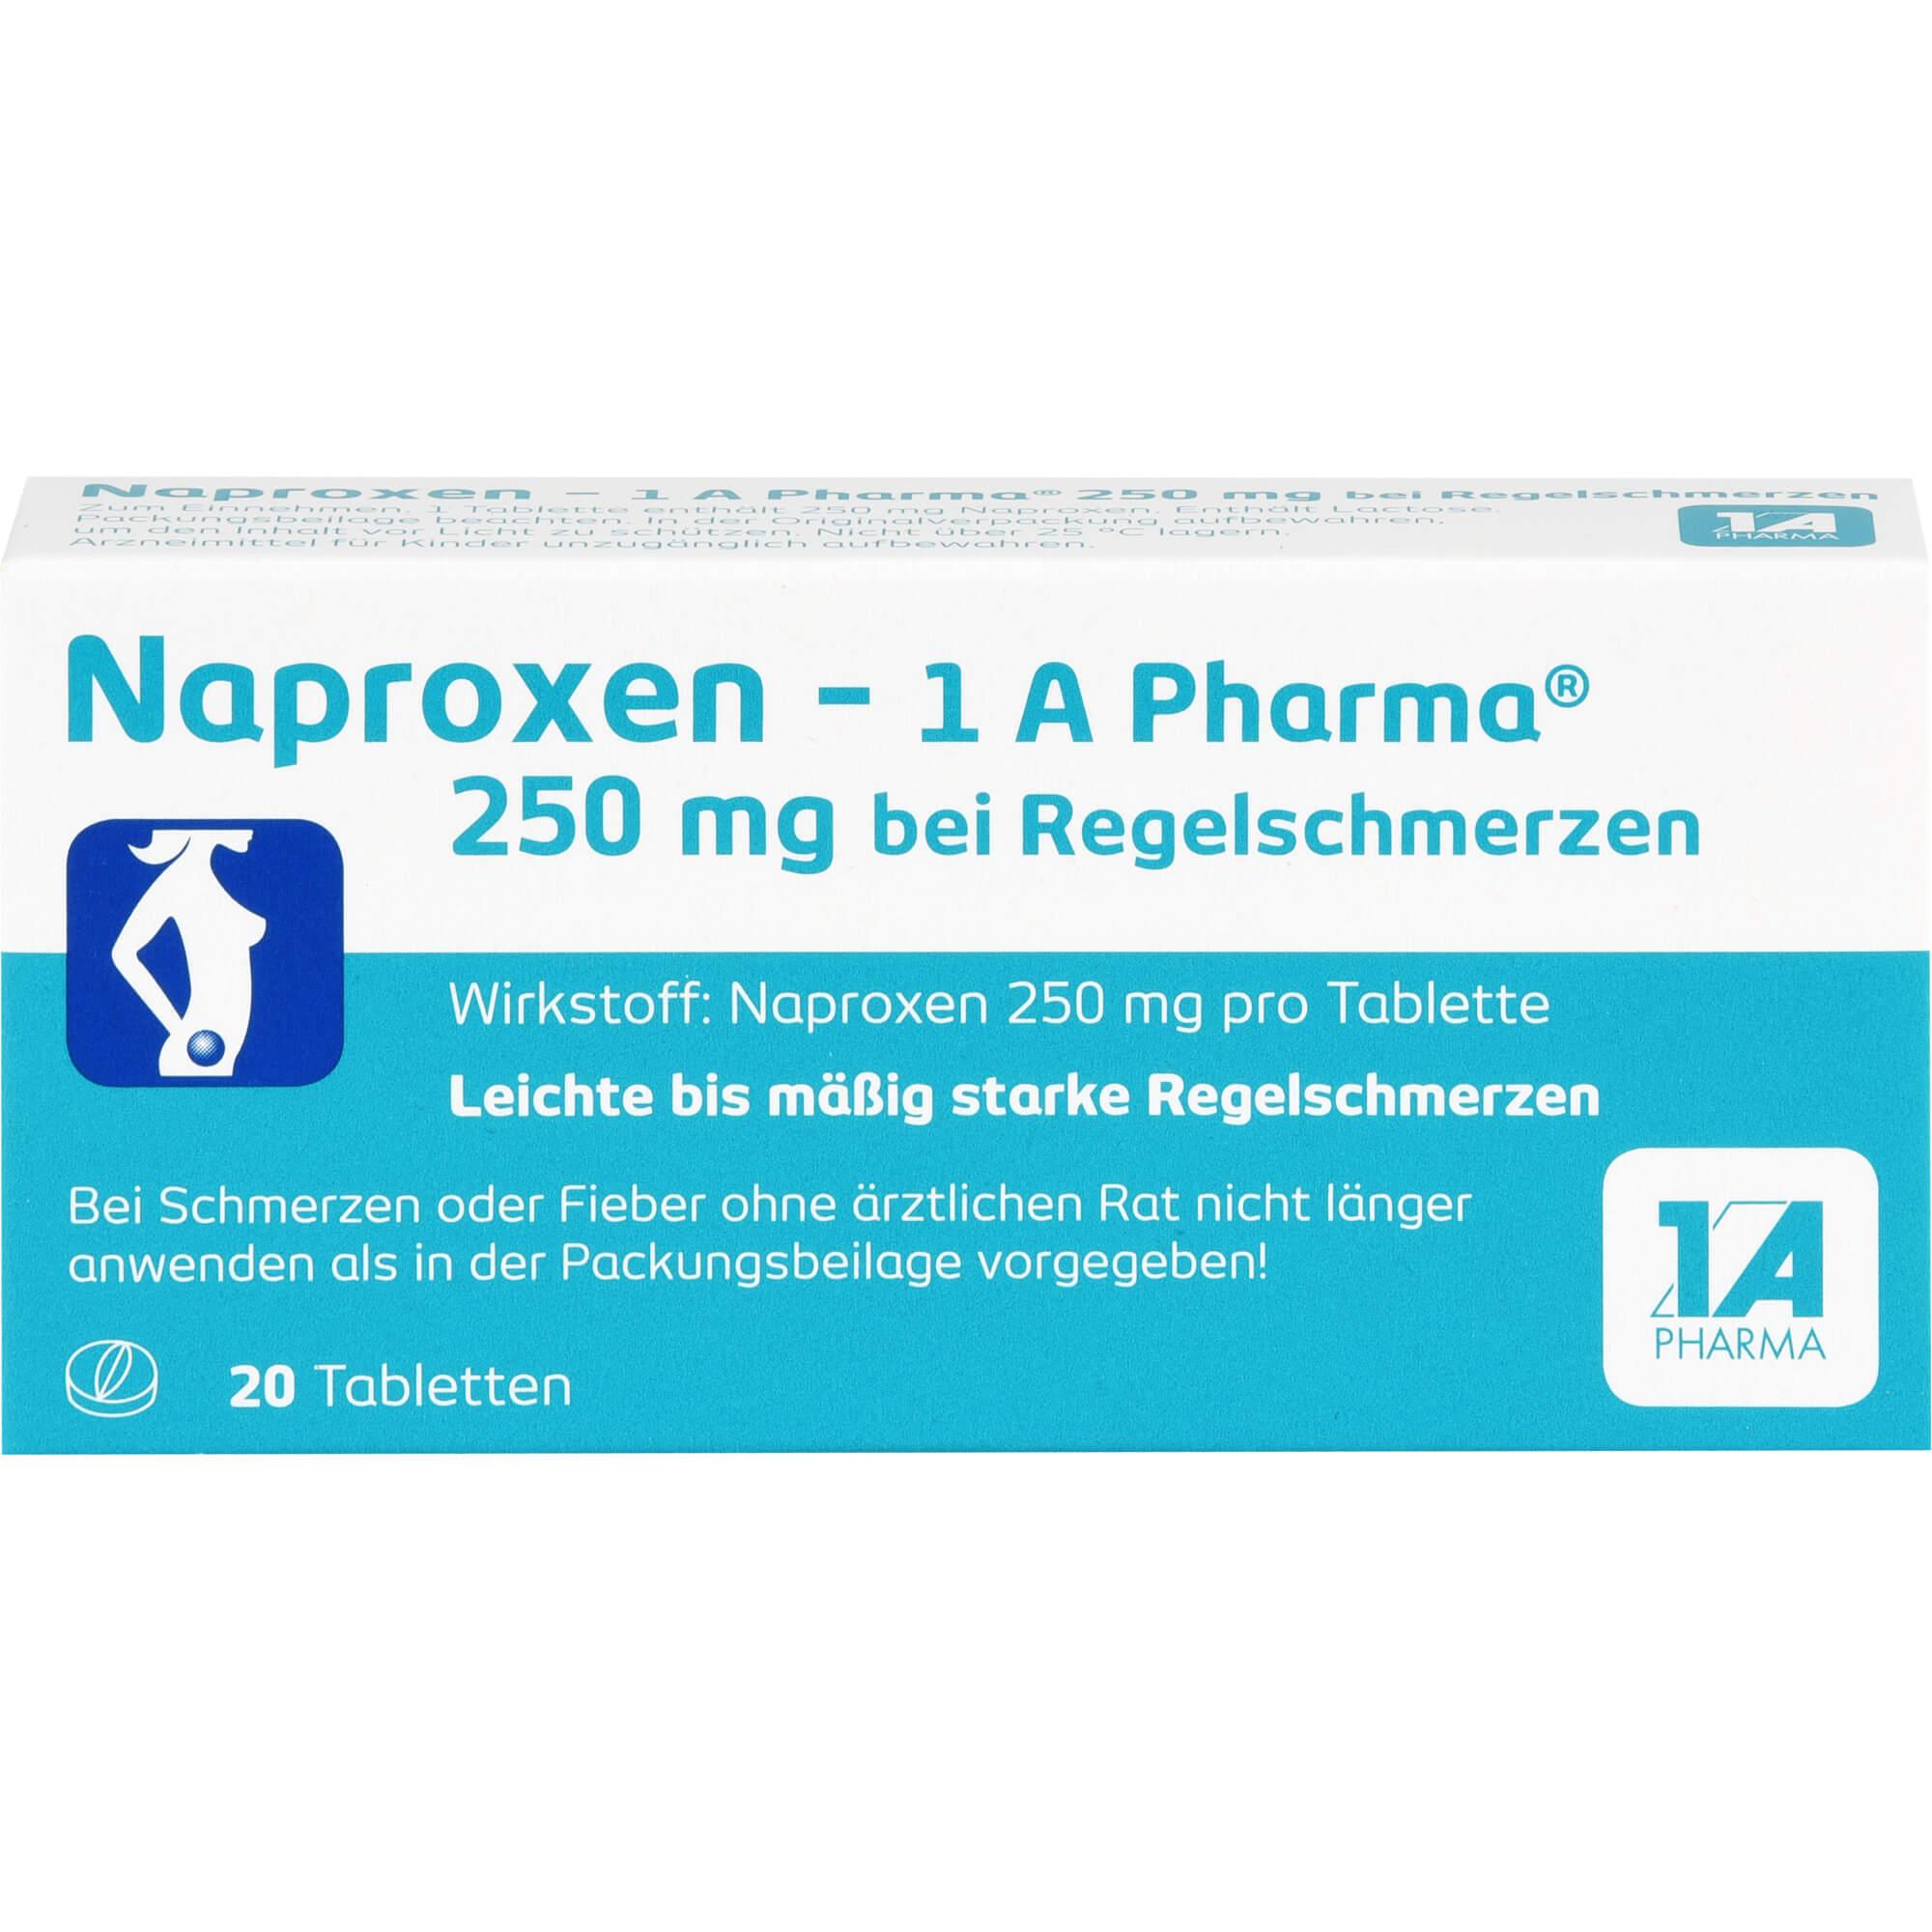 NAPROXEN-1A-Pharma-250-mg-b-Regelschmerzen-Tabl